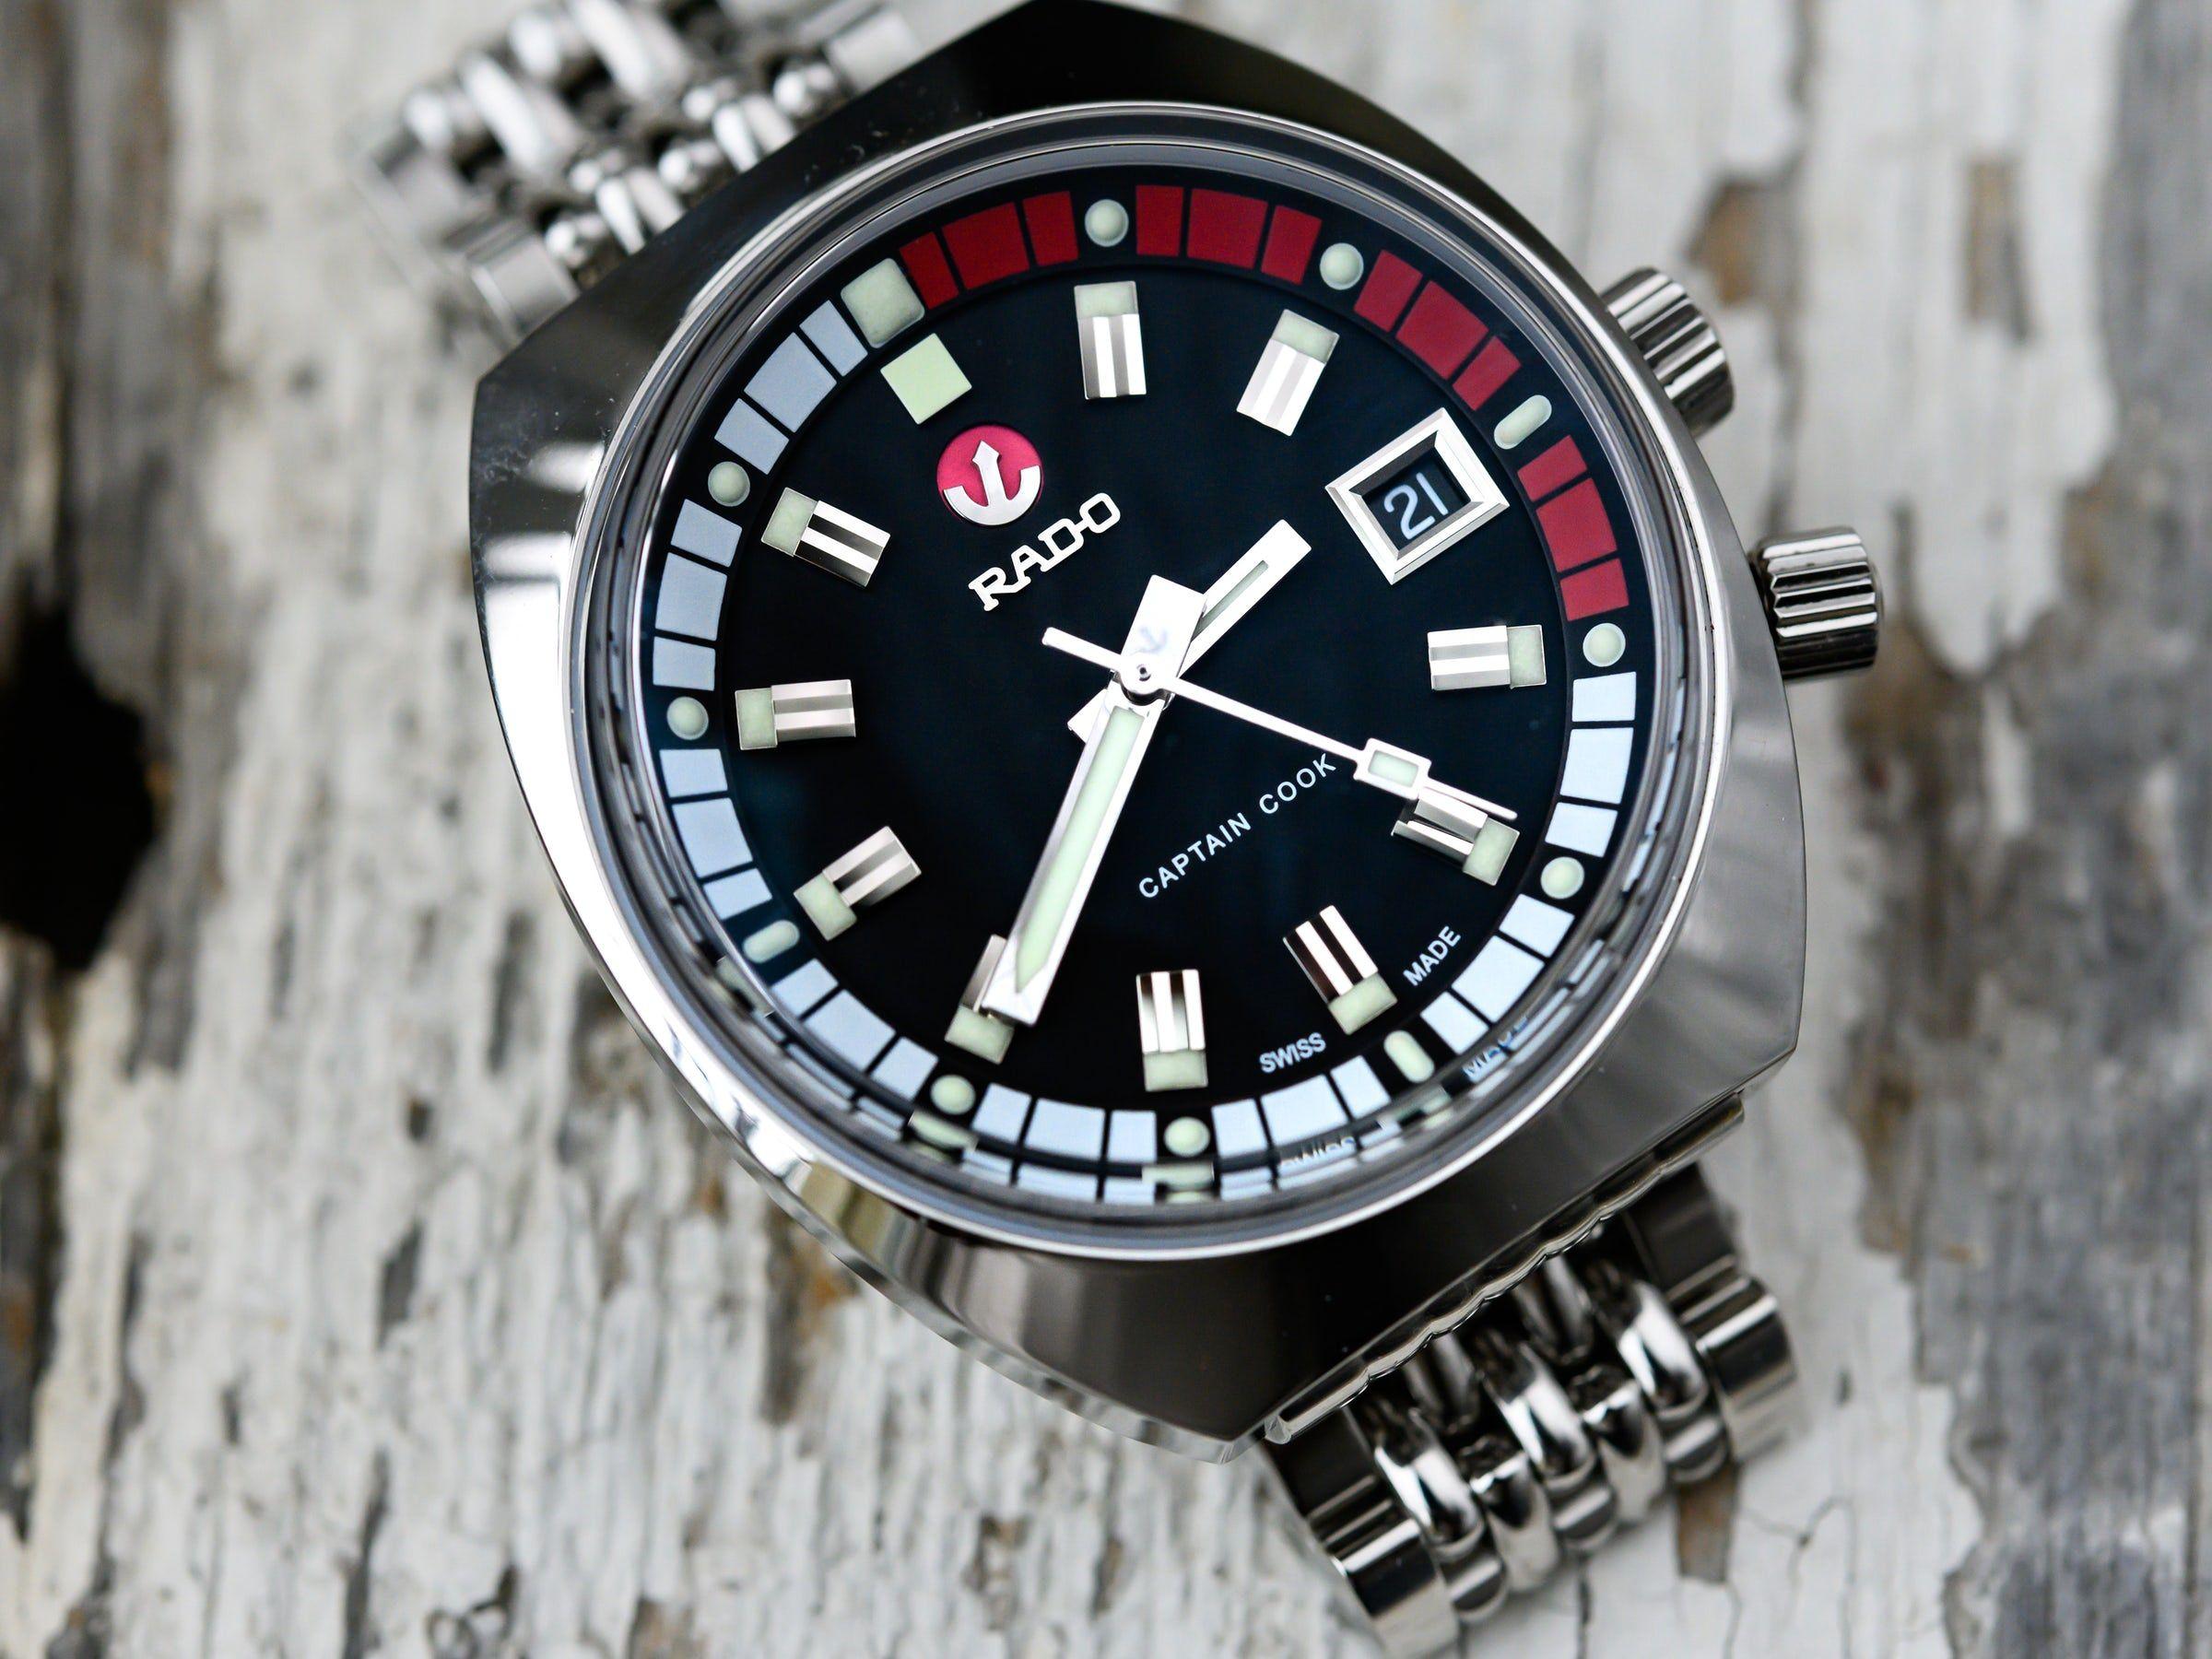 Hands On The Rado Hyperchrome Tradition Captain Cook Mk Ii Hodinkee Rado Captain Cook Watches For Men